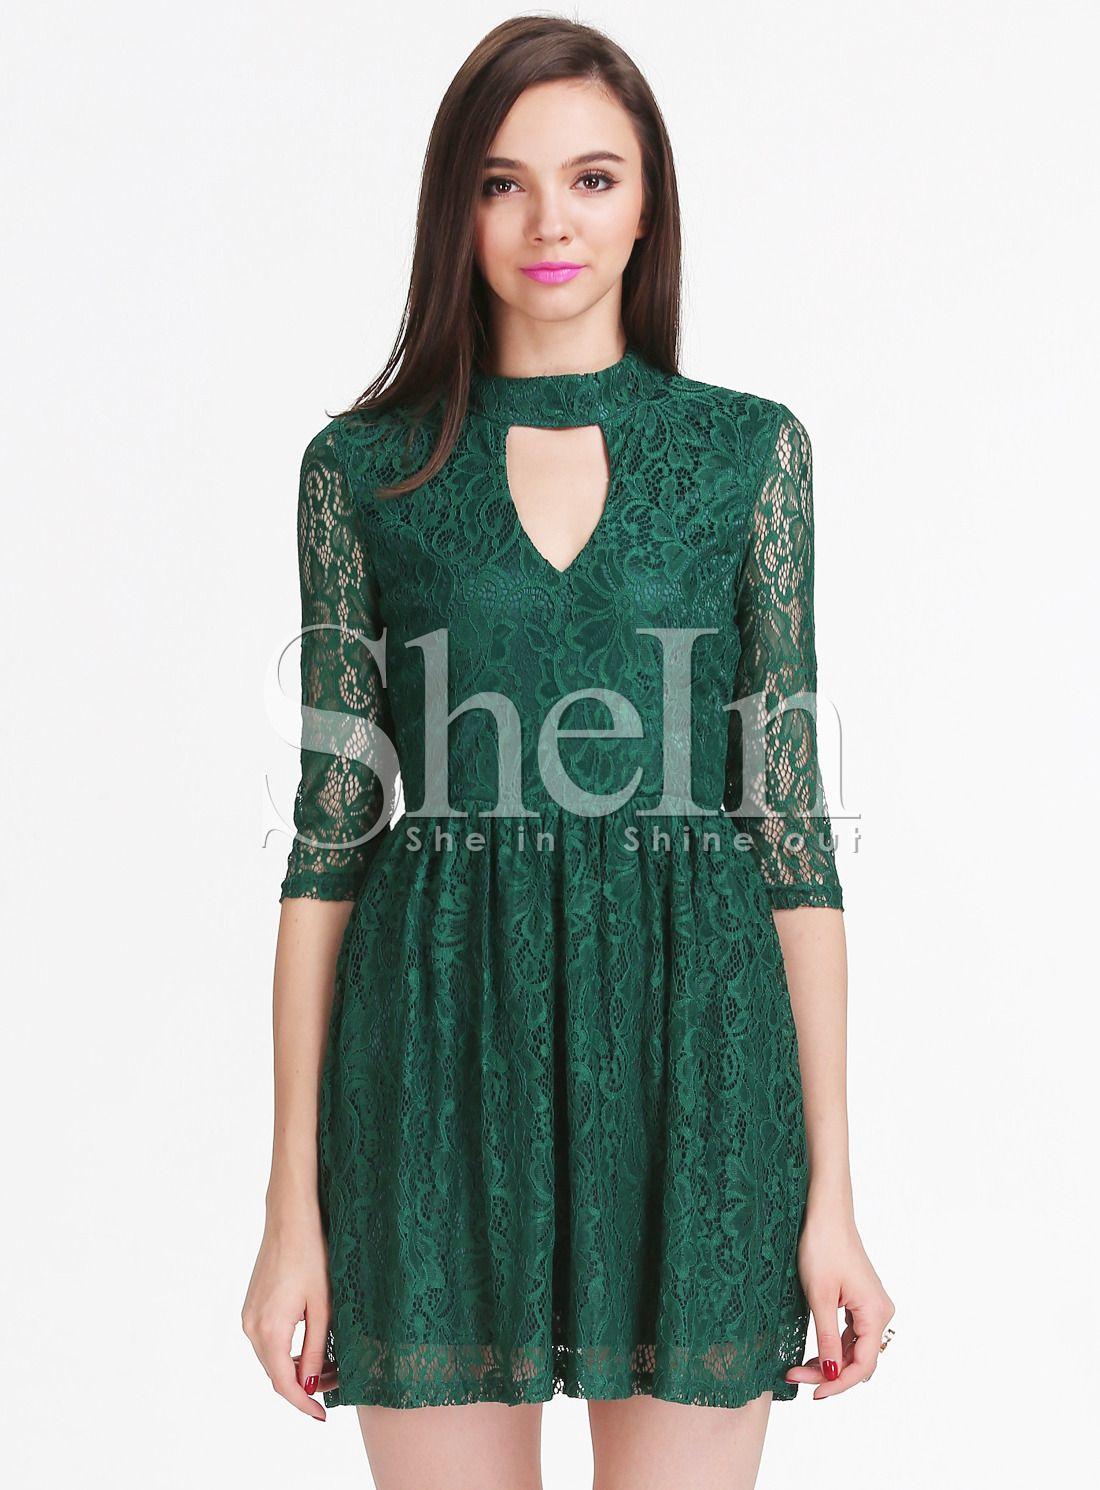 Green long sleeve cocktail dress  Green Long Sleeve Hollow Lace Pleated Dress   Fashion Lovelies